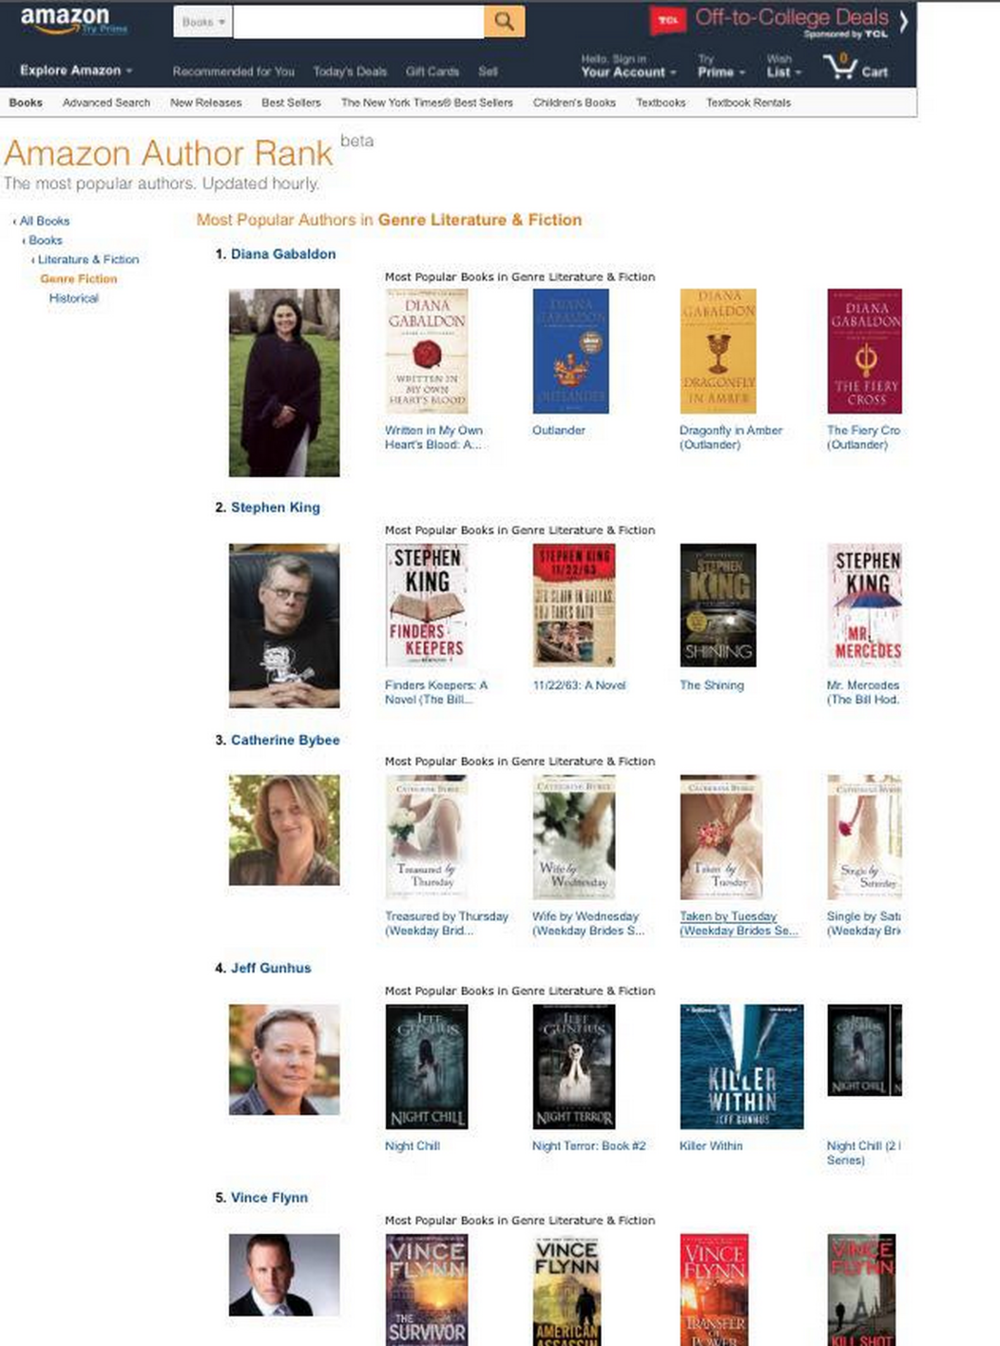 amazon-author-list.jpg